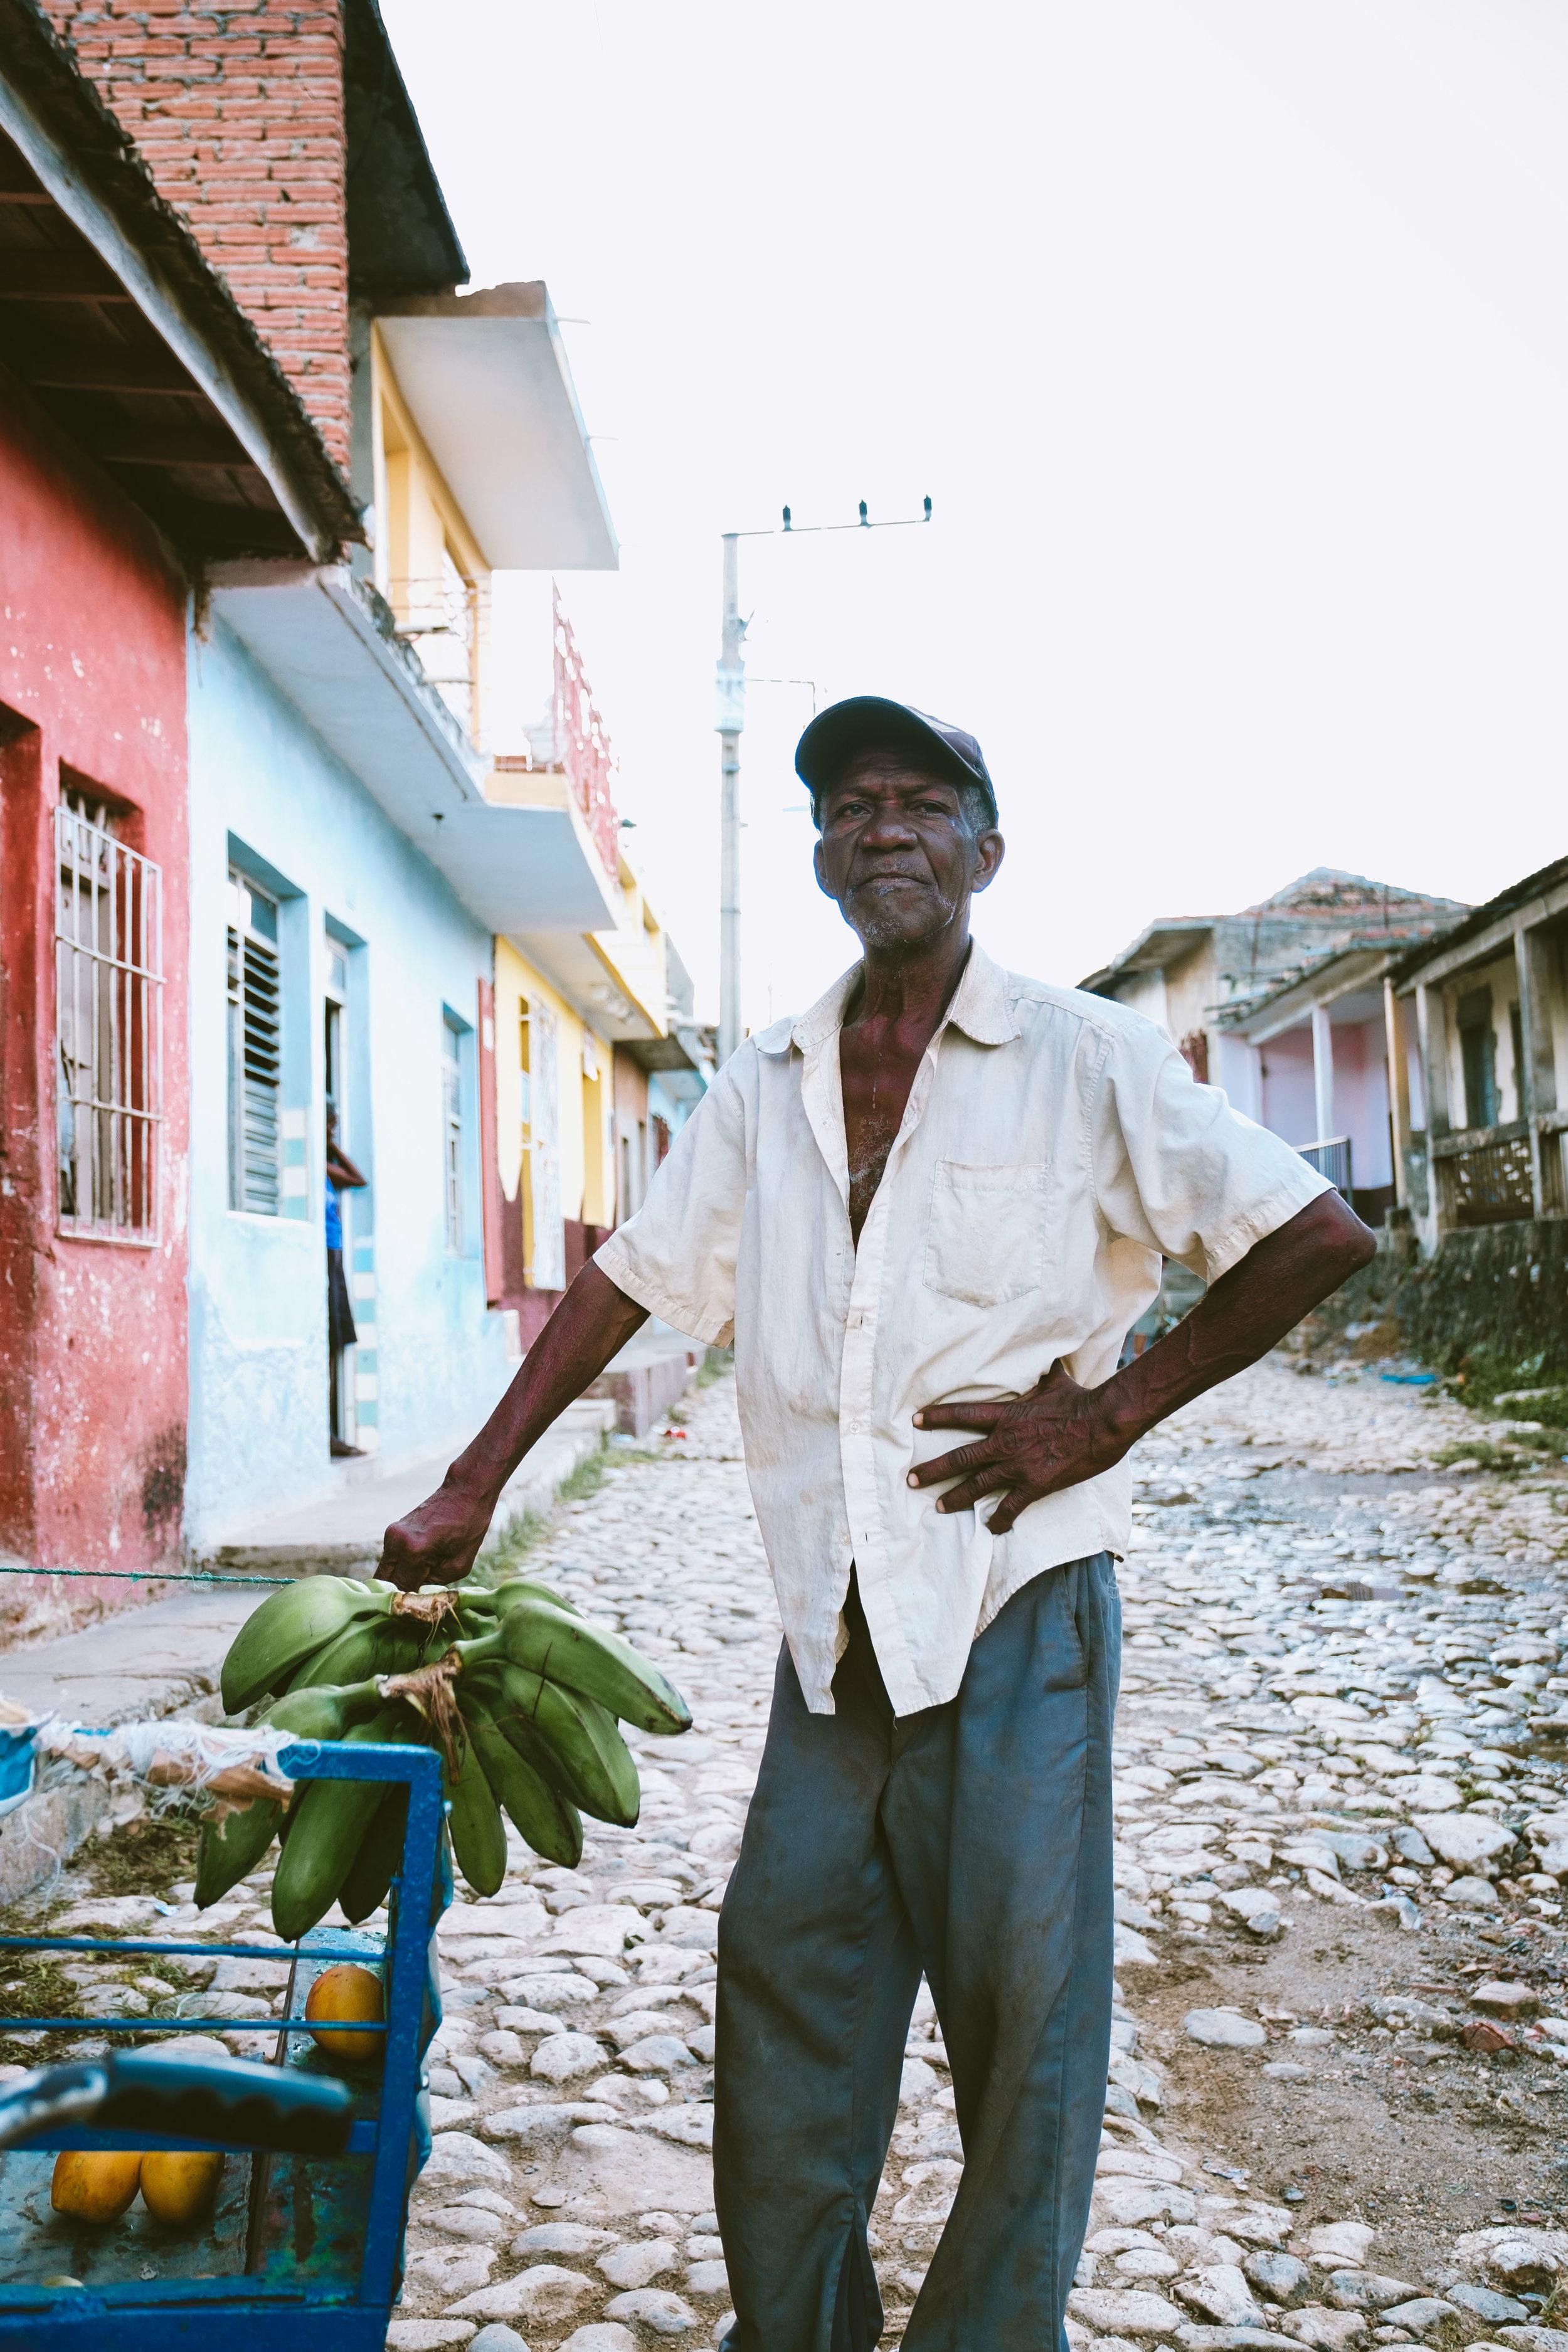 Cookwilltravel - Cuba - DSCF8685.jpg